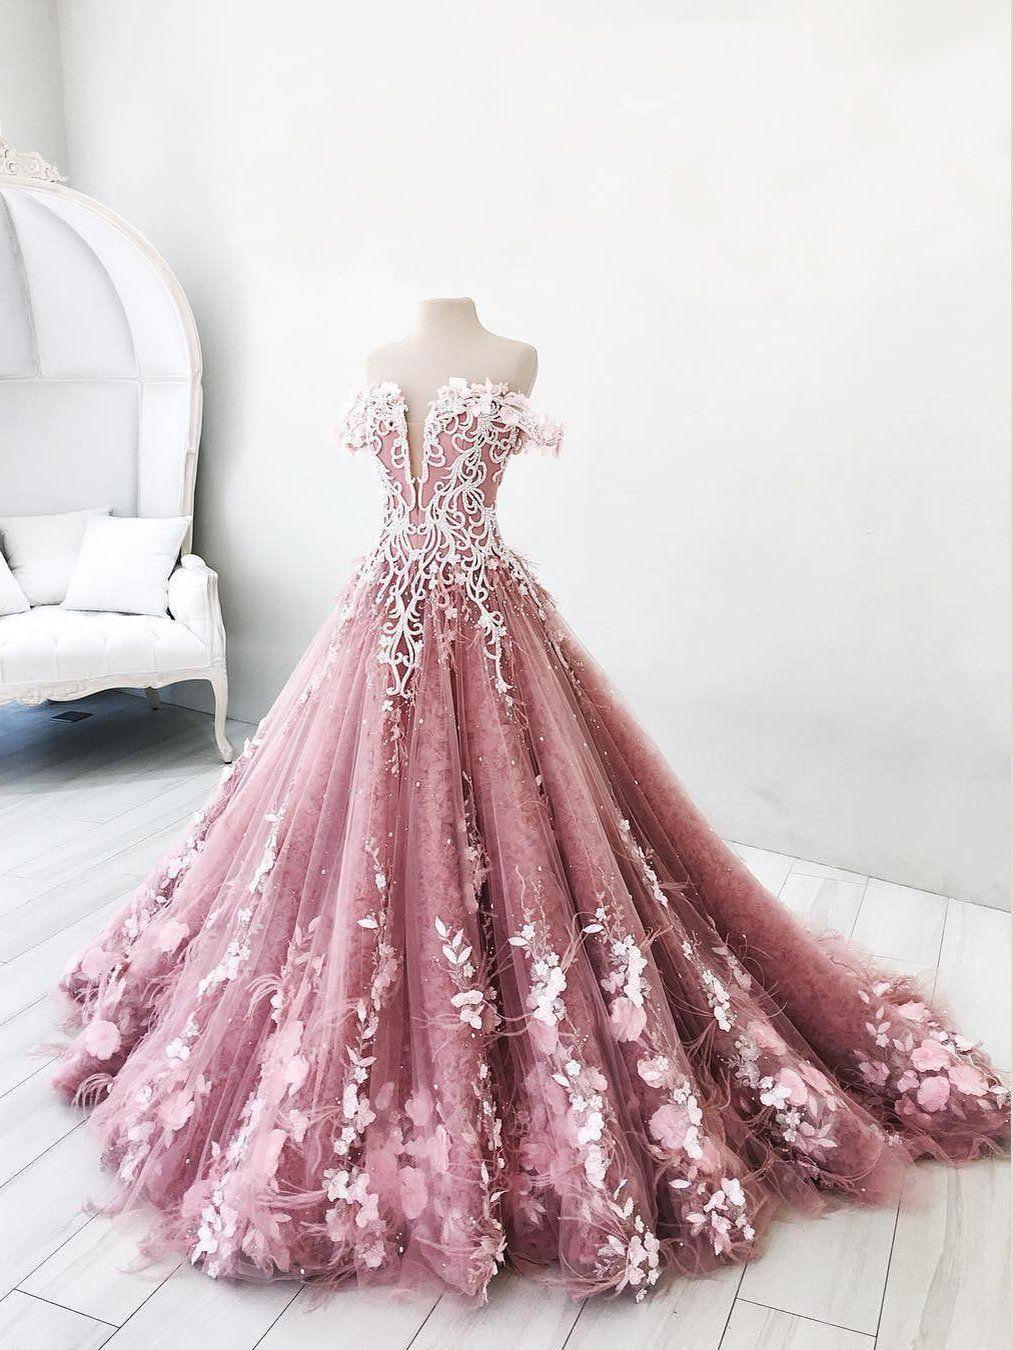 67b3203d611 Ball Gown Wedding Dresses Romantic Long Train Luxury Lace Big Bridal Gown  JKW205